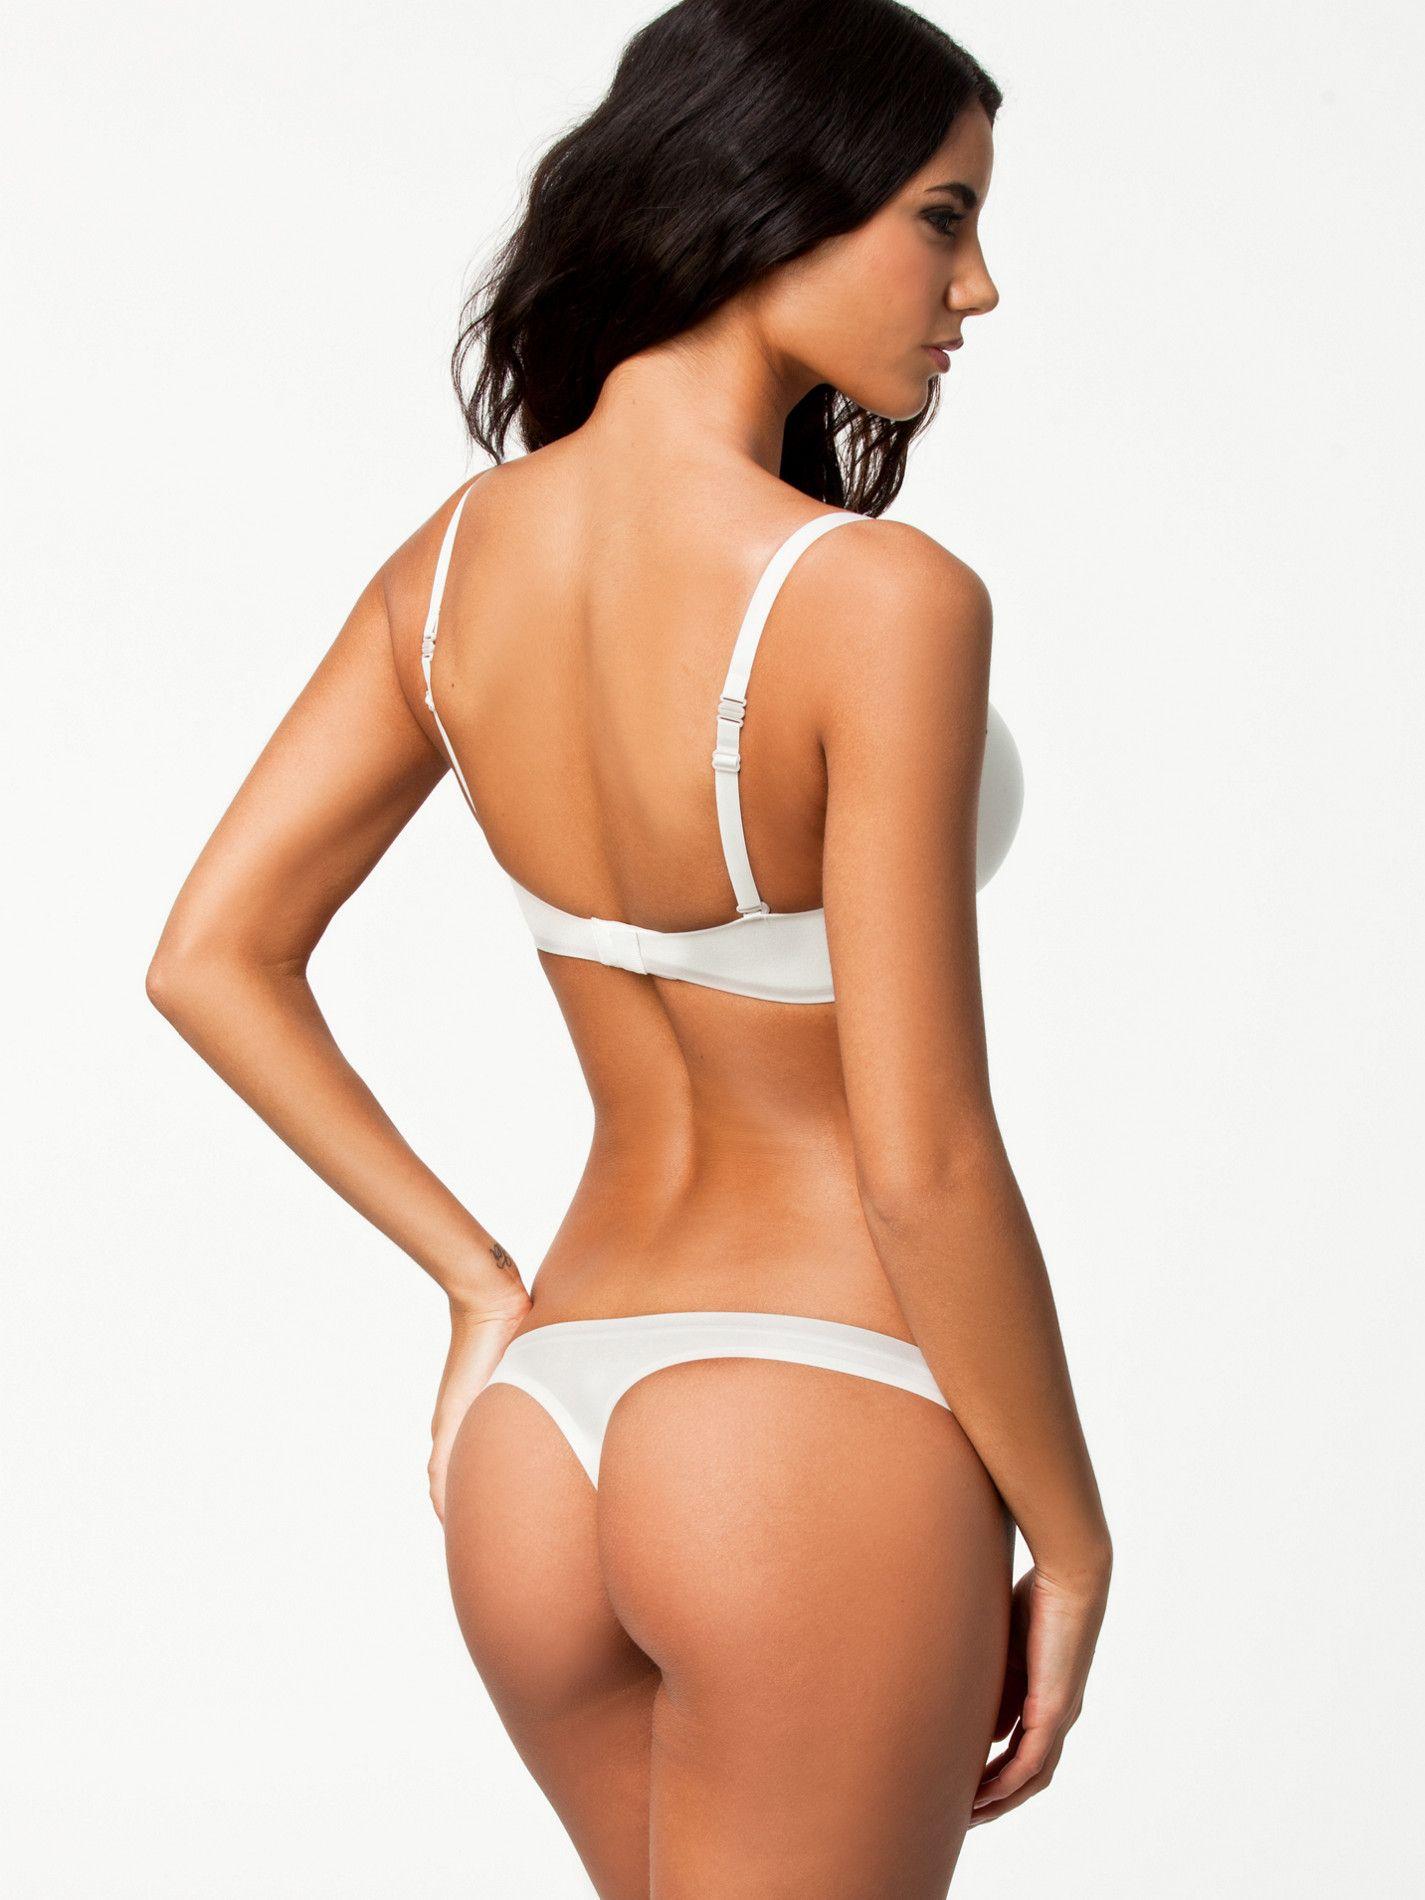 Panties sale bikini for